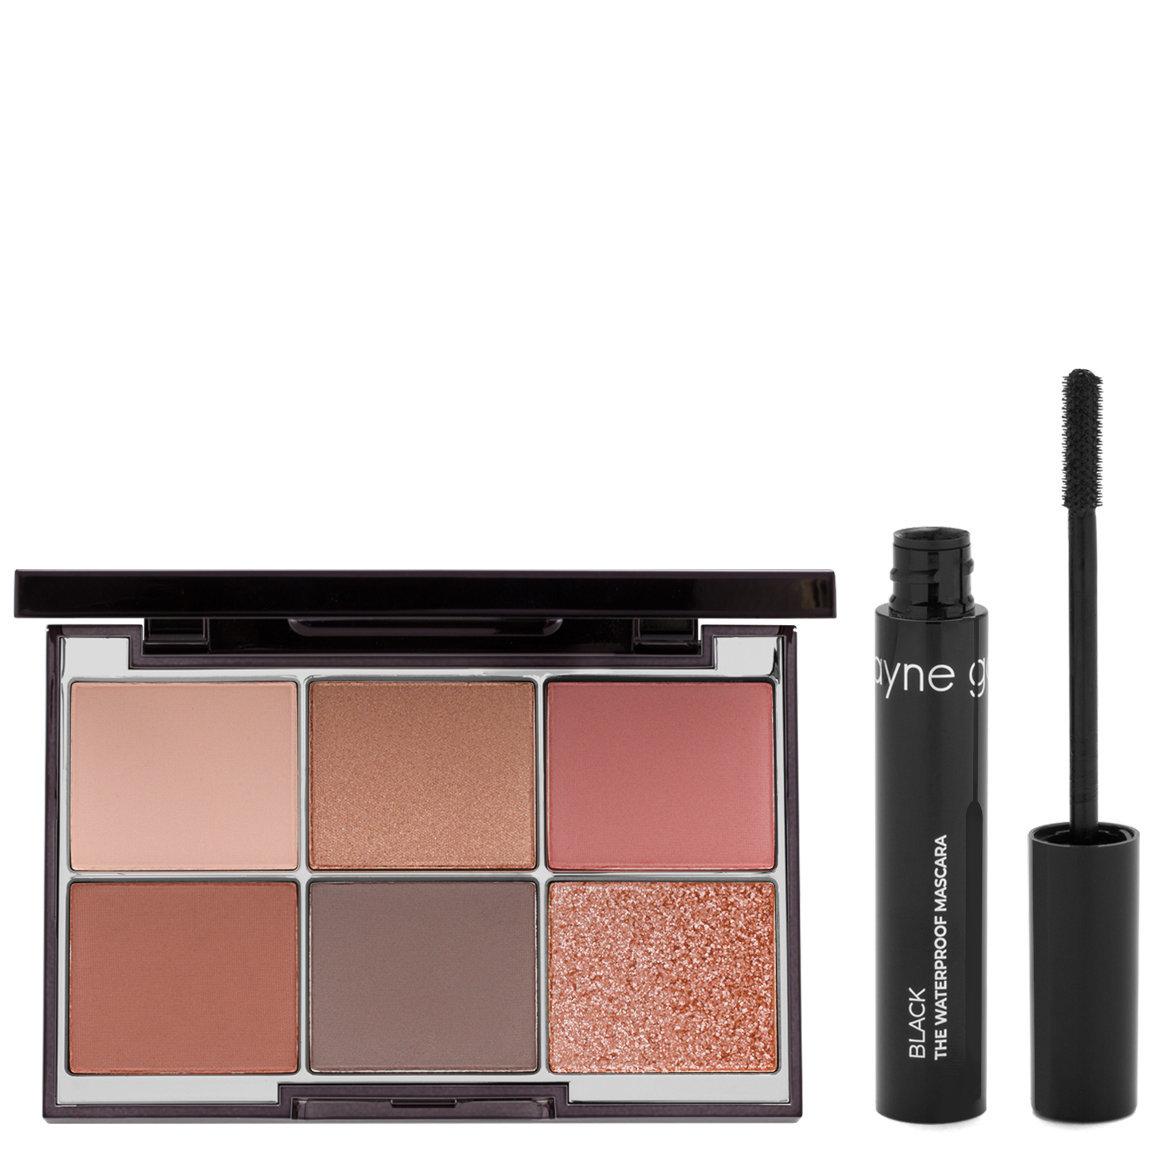 Wayne Goss Pearl Luxury Eye Palette + Waterproof Mascara alternative view 1 - product swatch.